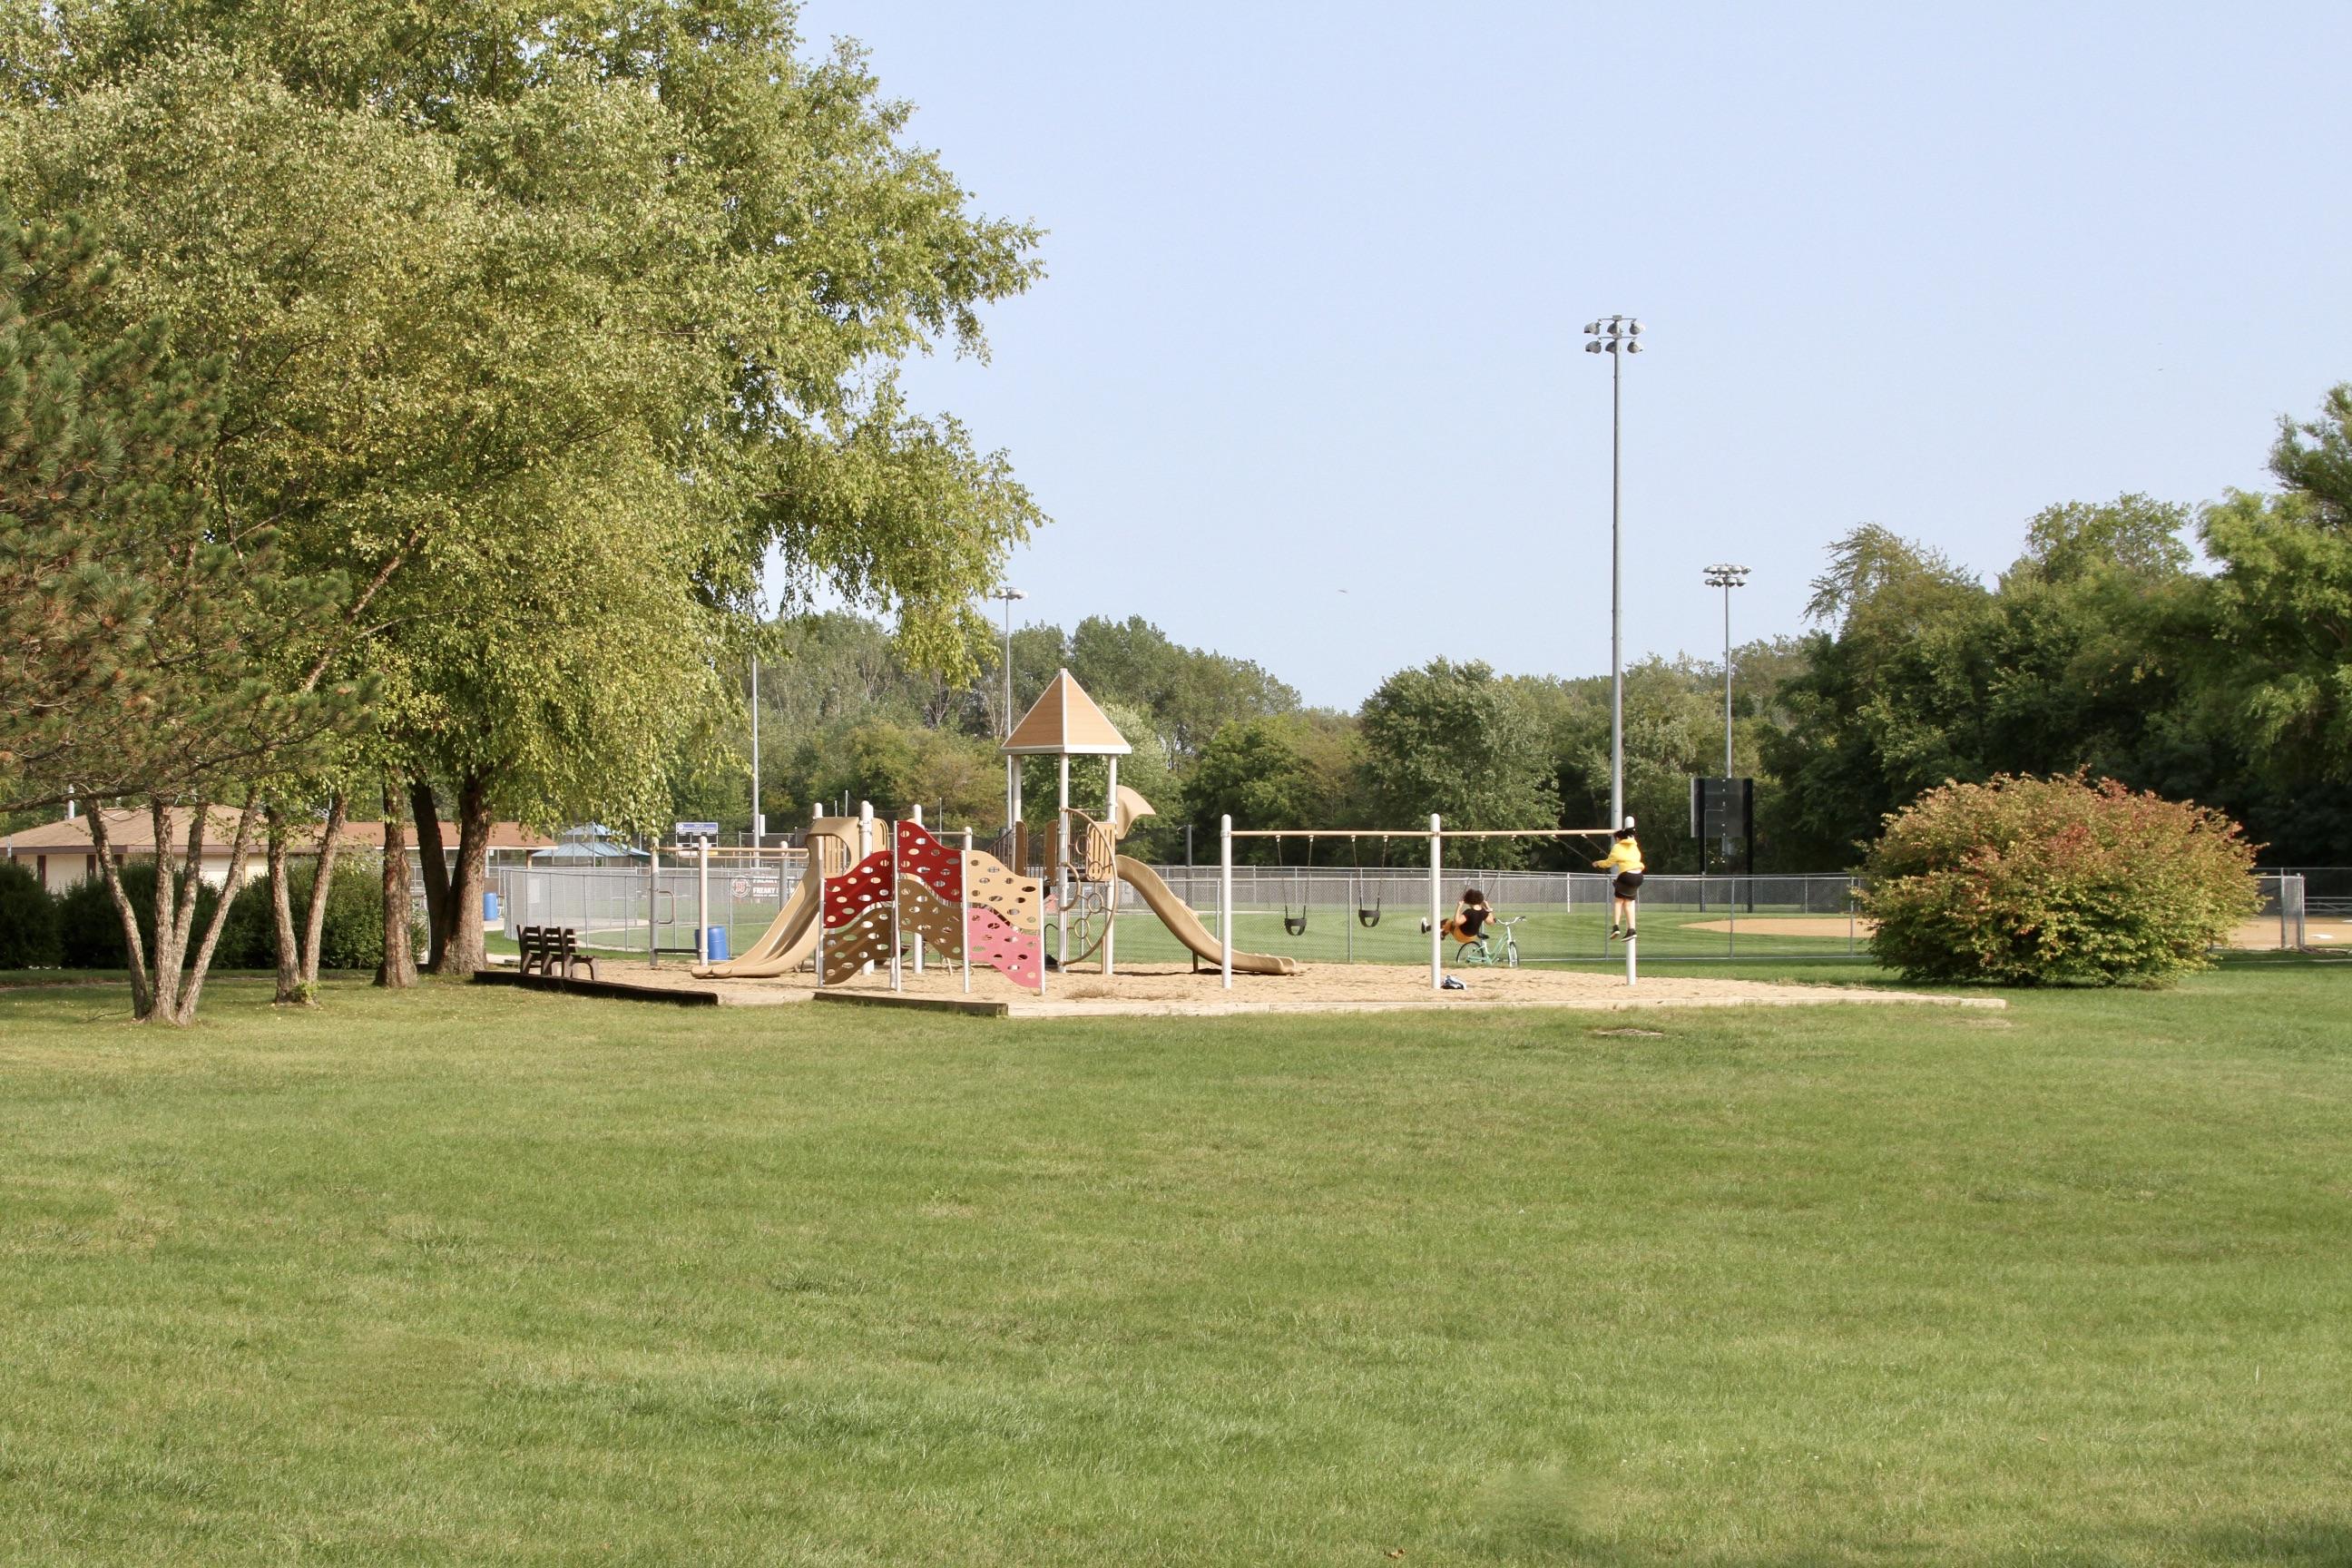 Bates Park